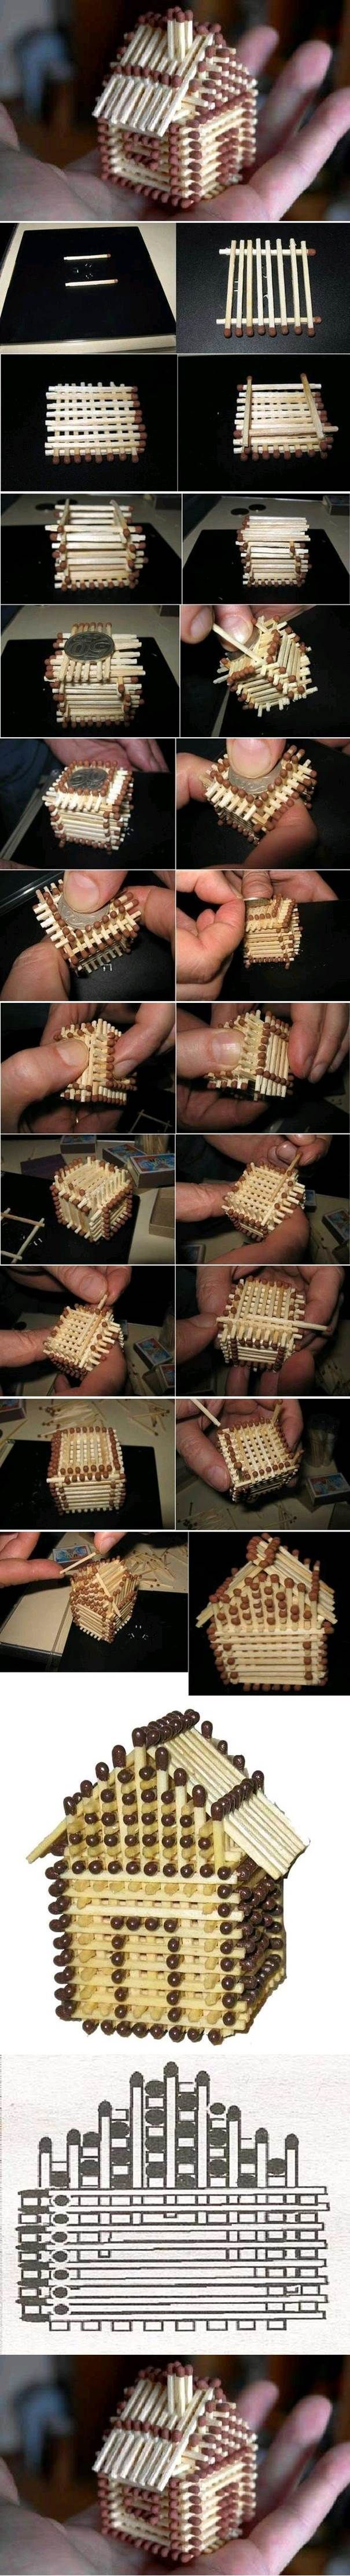 DIY Mini House with Matches   iCreativeIdeas.com Like Us on Facebook ==> https://www.facebook.com/icreativeideas